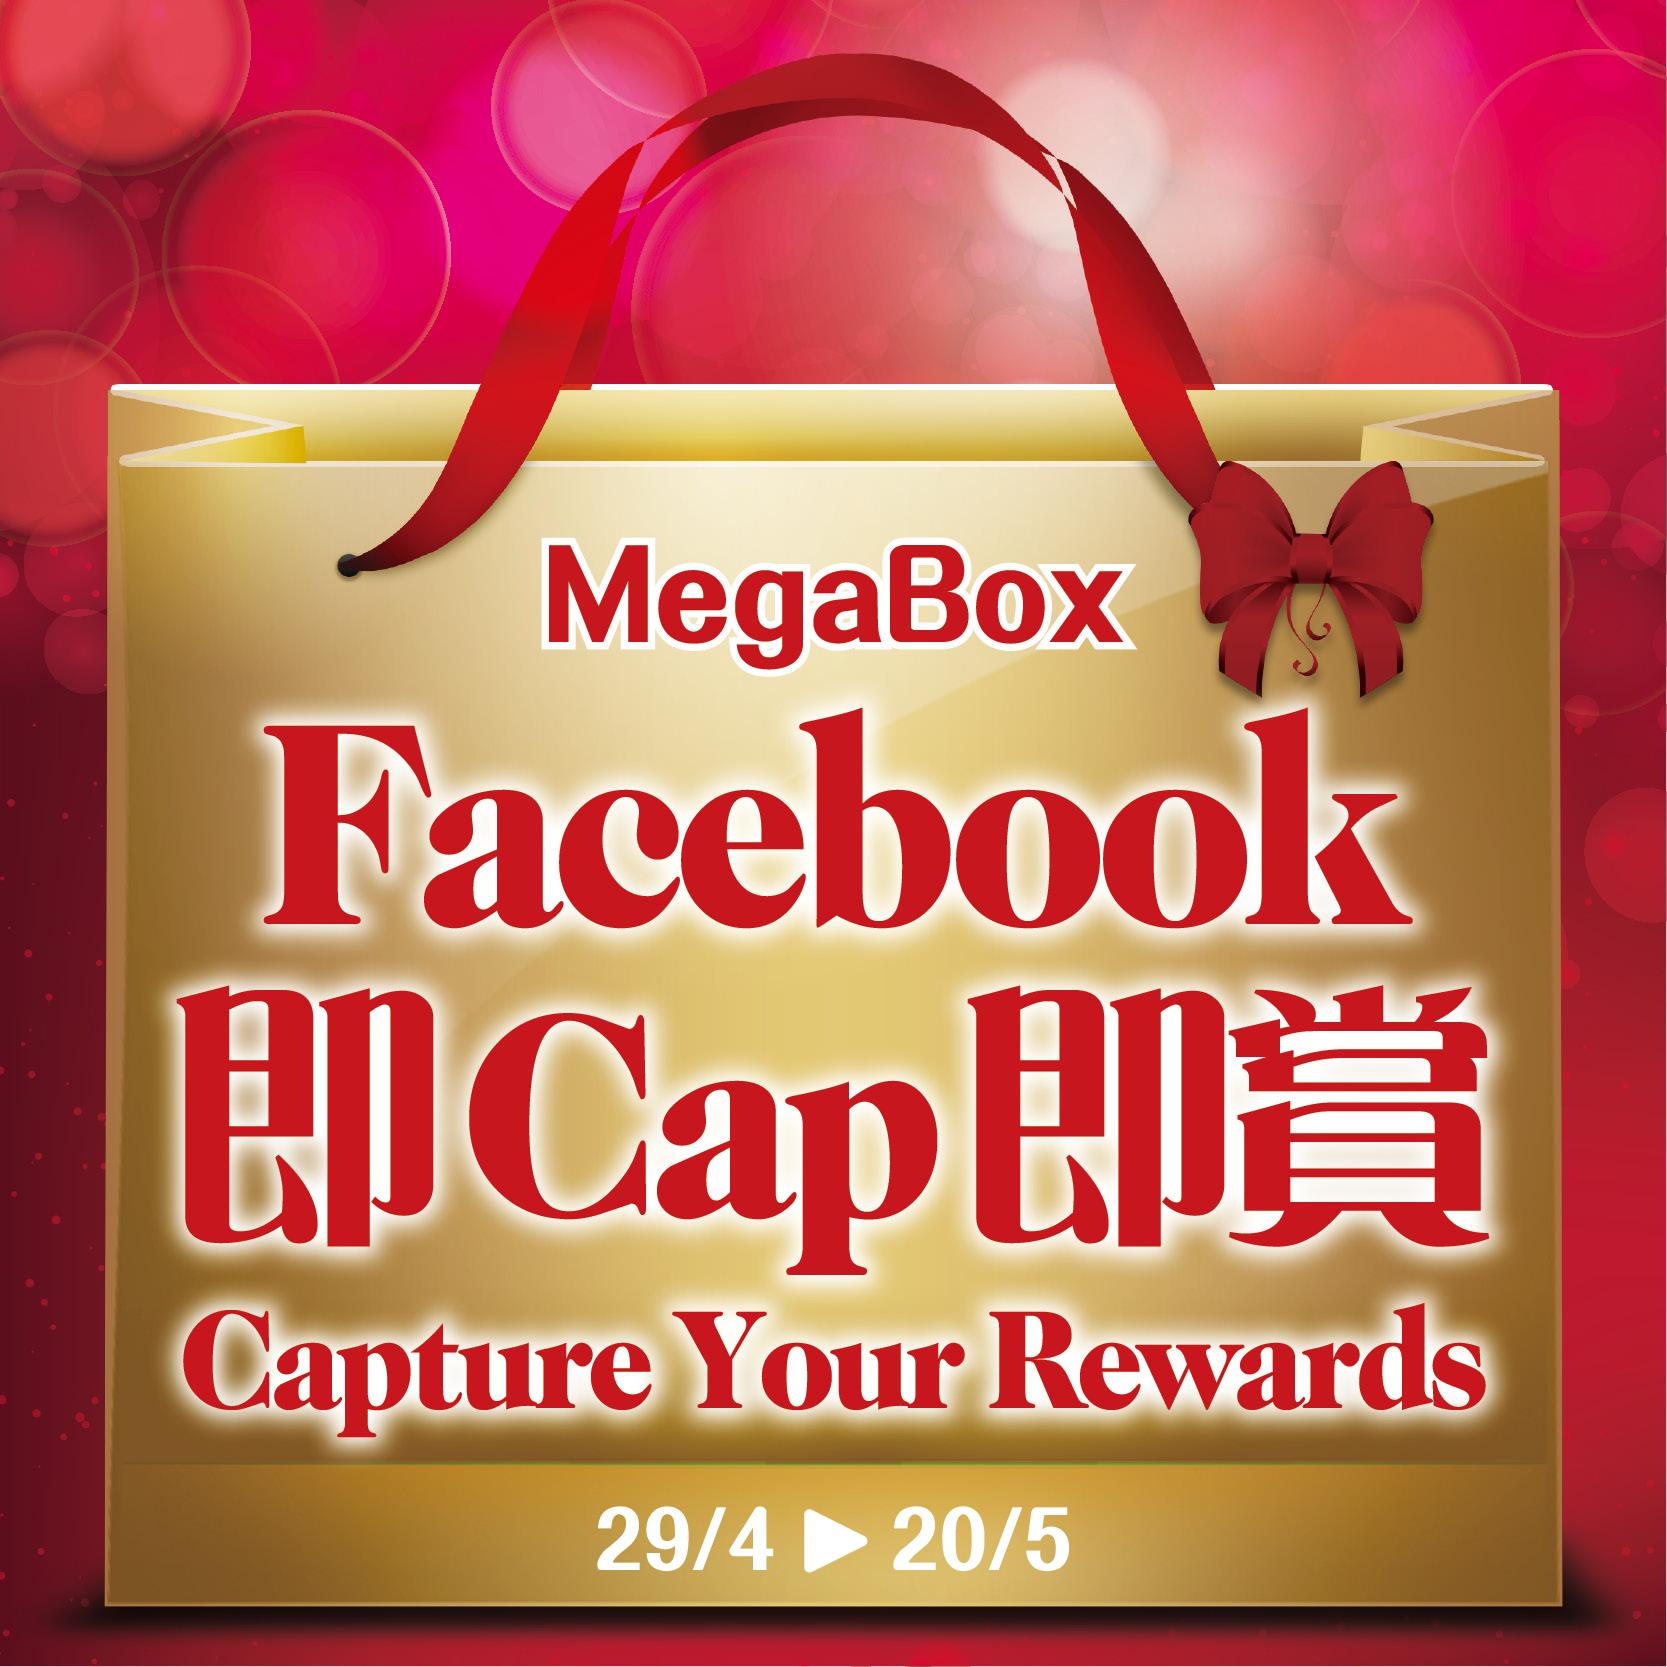 """CAPTURE YOUR REWARDS"" FACEBOOK GAME"